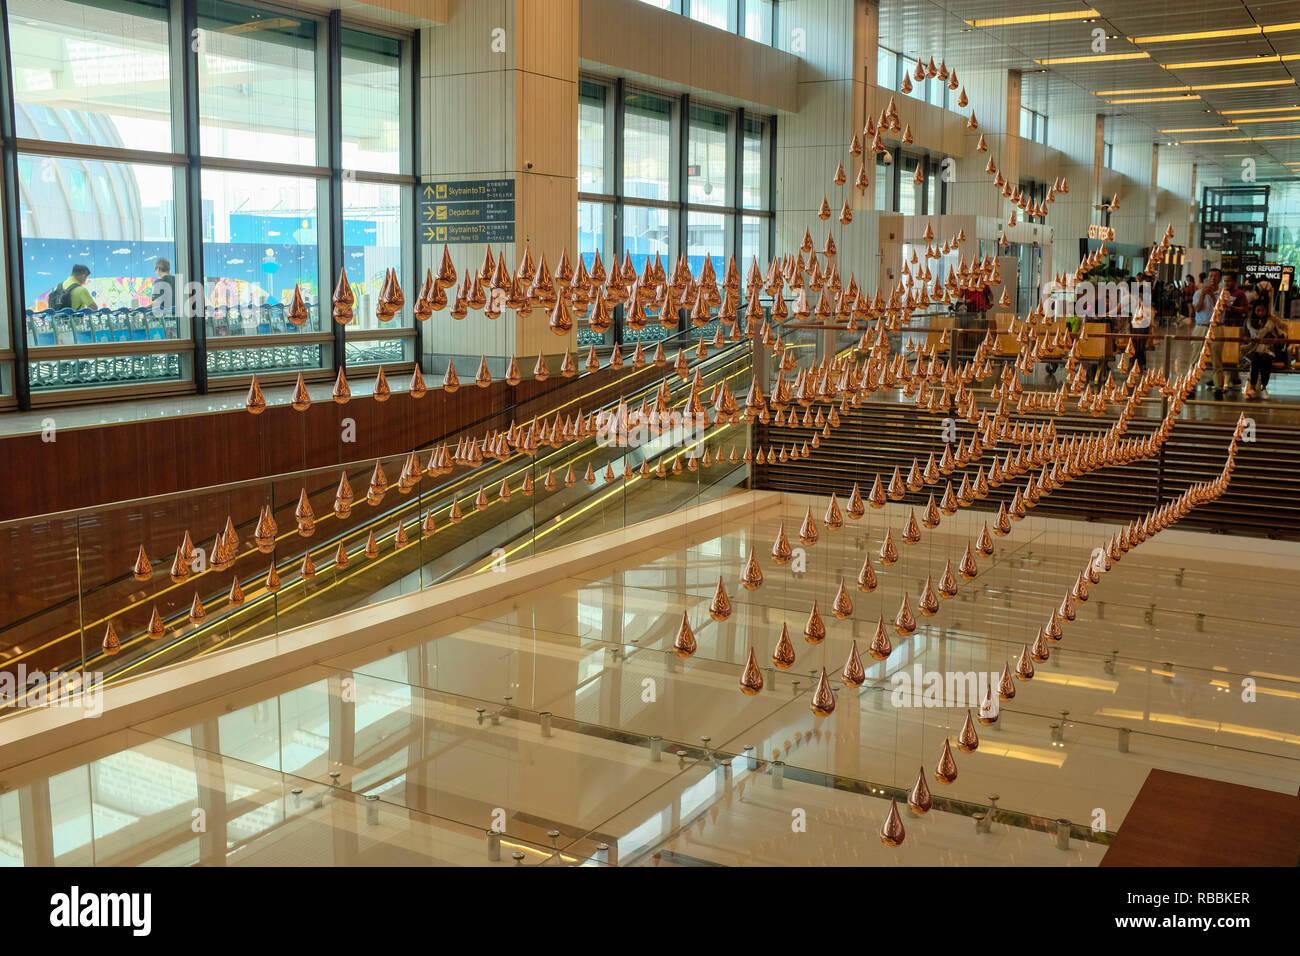 Kinetic Rain Art Sculpture at Singapore Changi Airport. - Stock Image